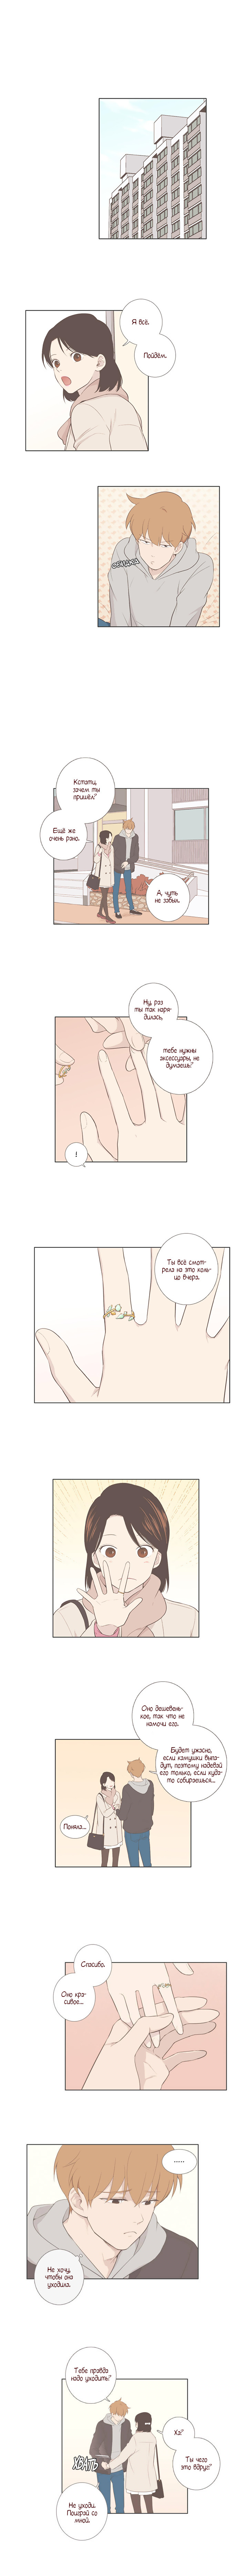 https://r1.ninemanga.com/comics/pic2/12/22860/419711/1534422504239.jpg Page 6